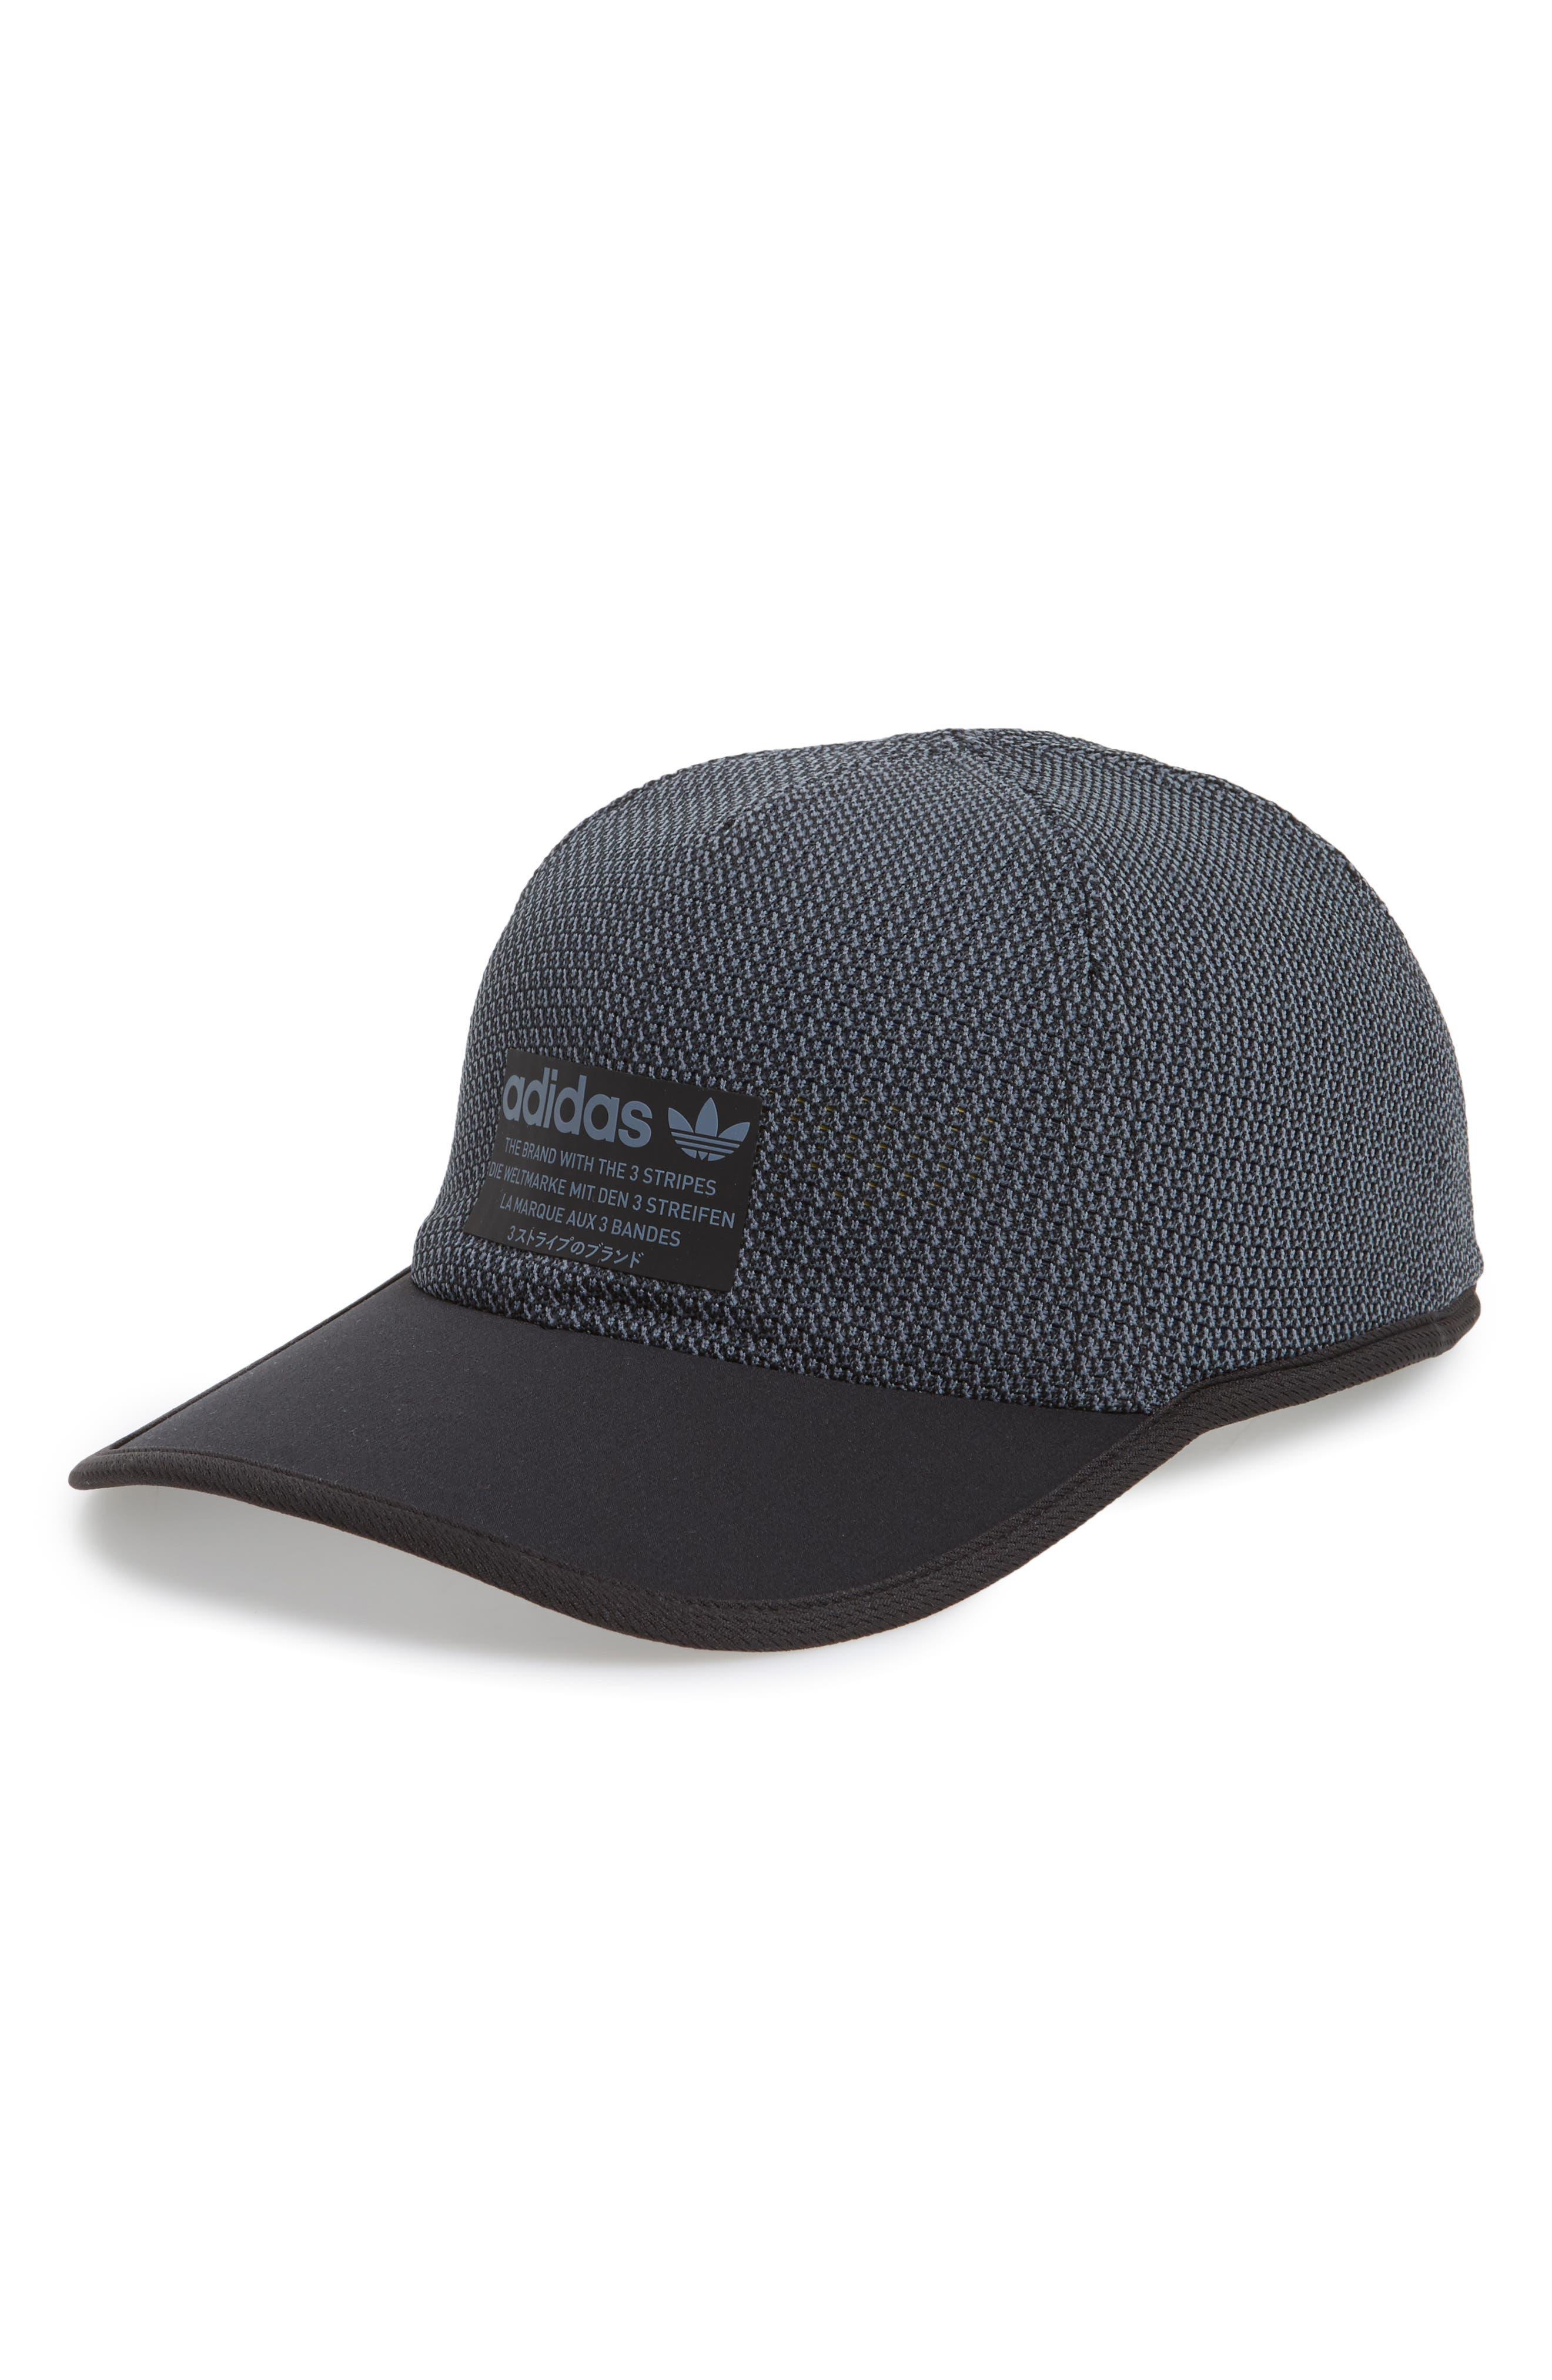 adidas Originals NMD Prime Baseball Cap